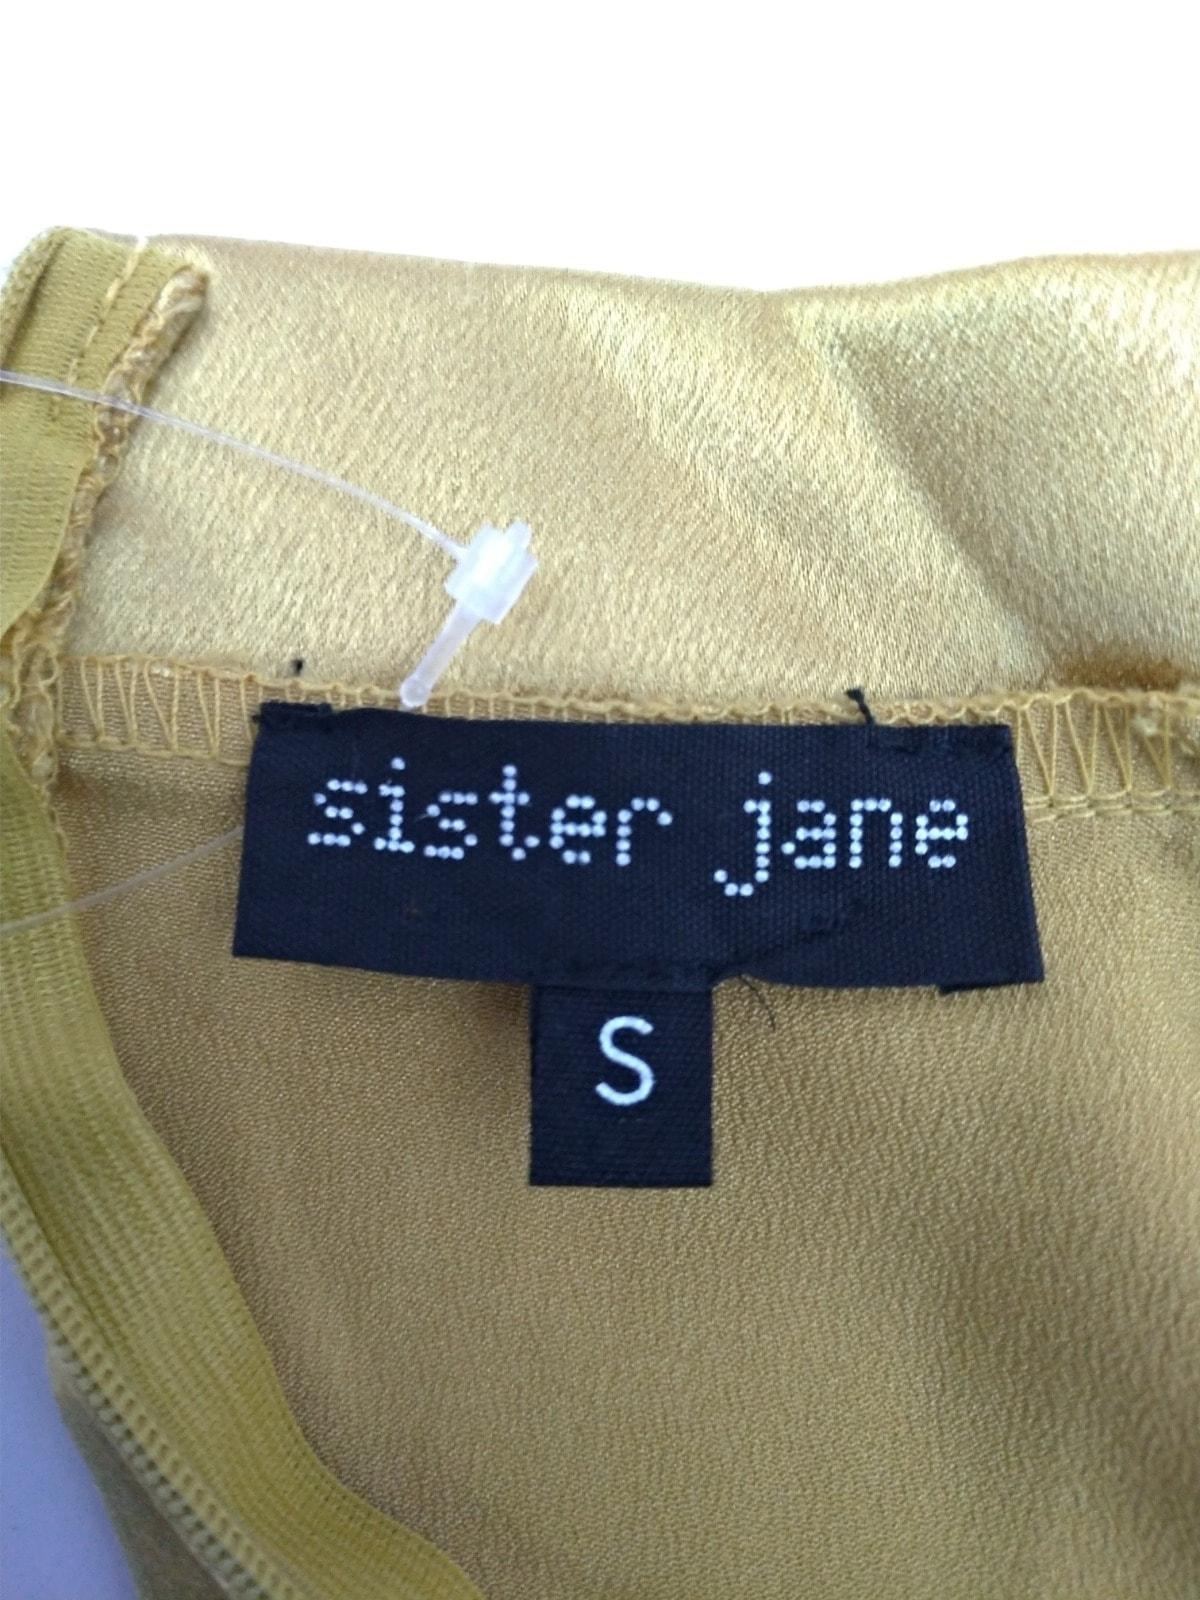 Sister Jane(シスタージェーン)のカットソー